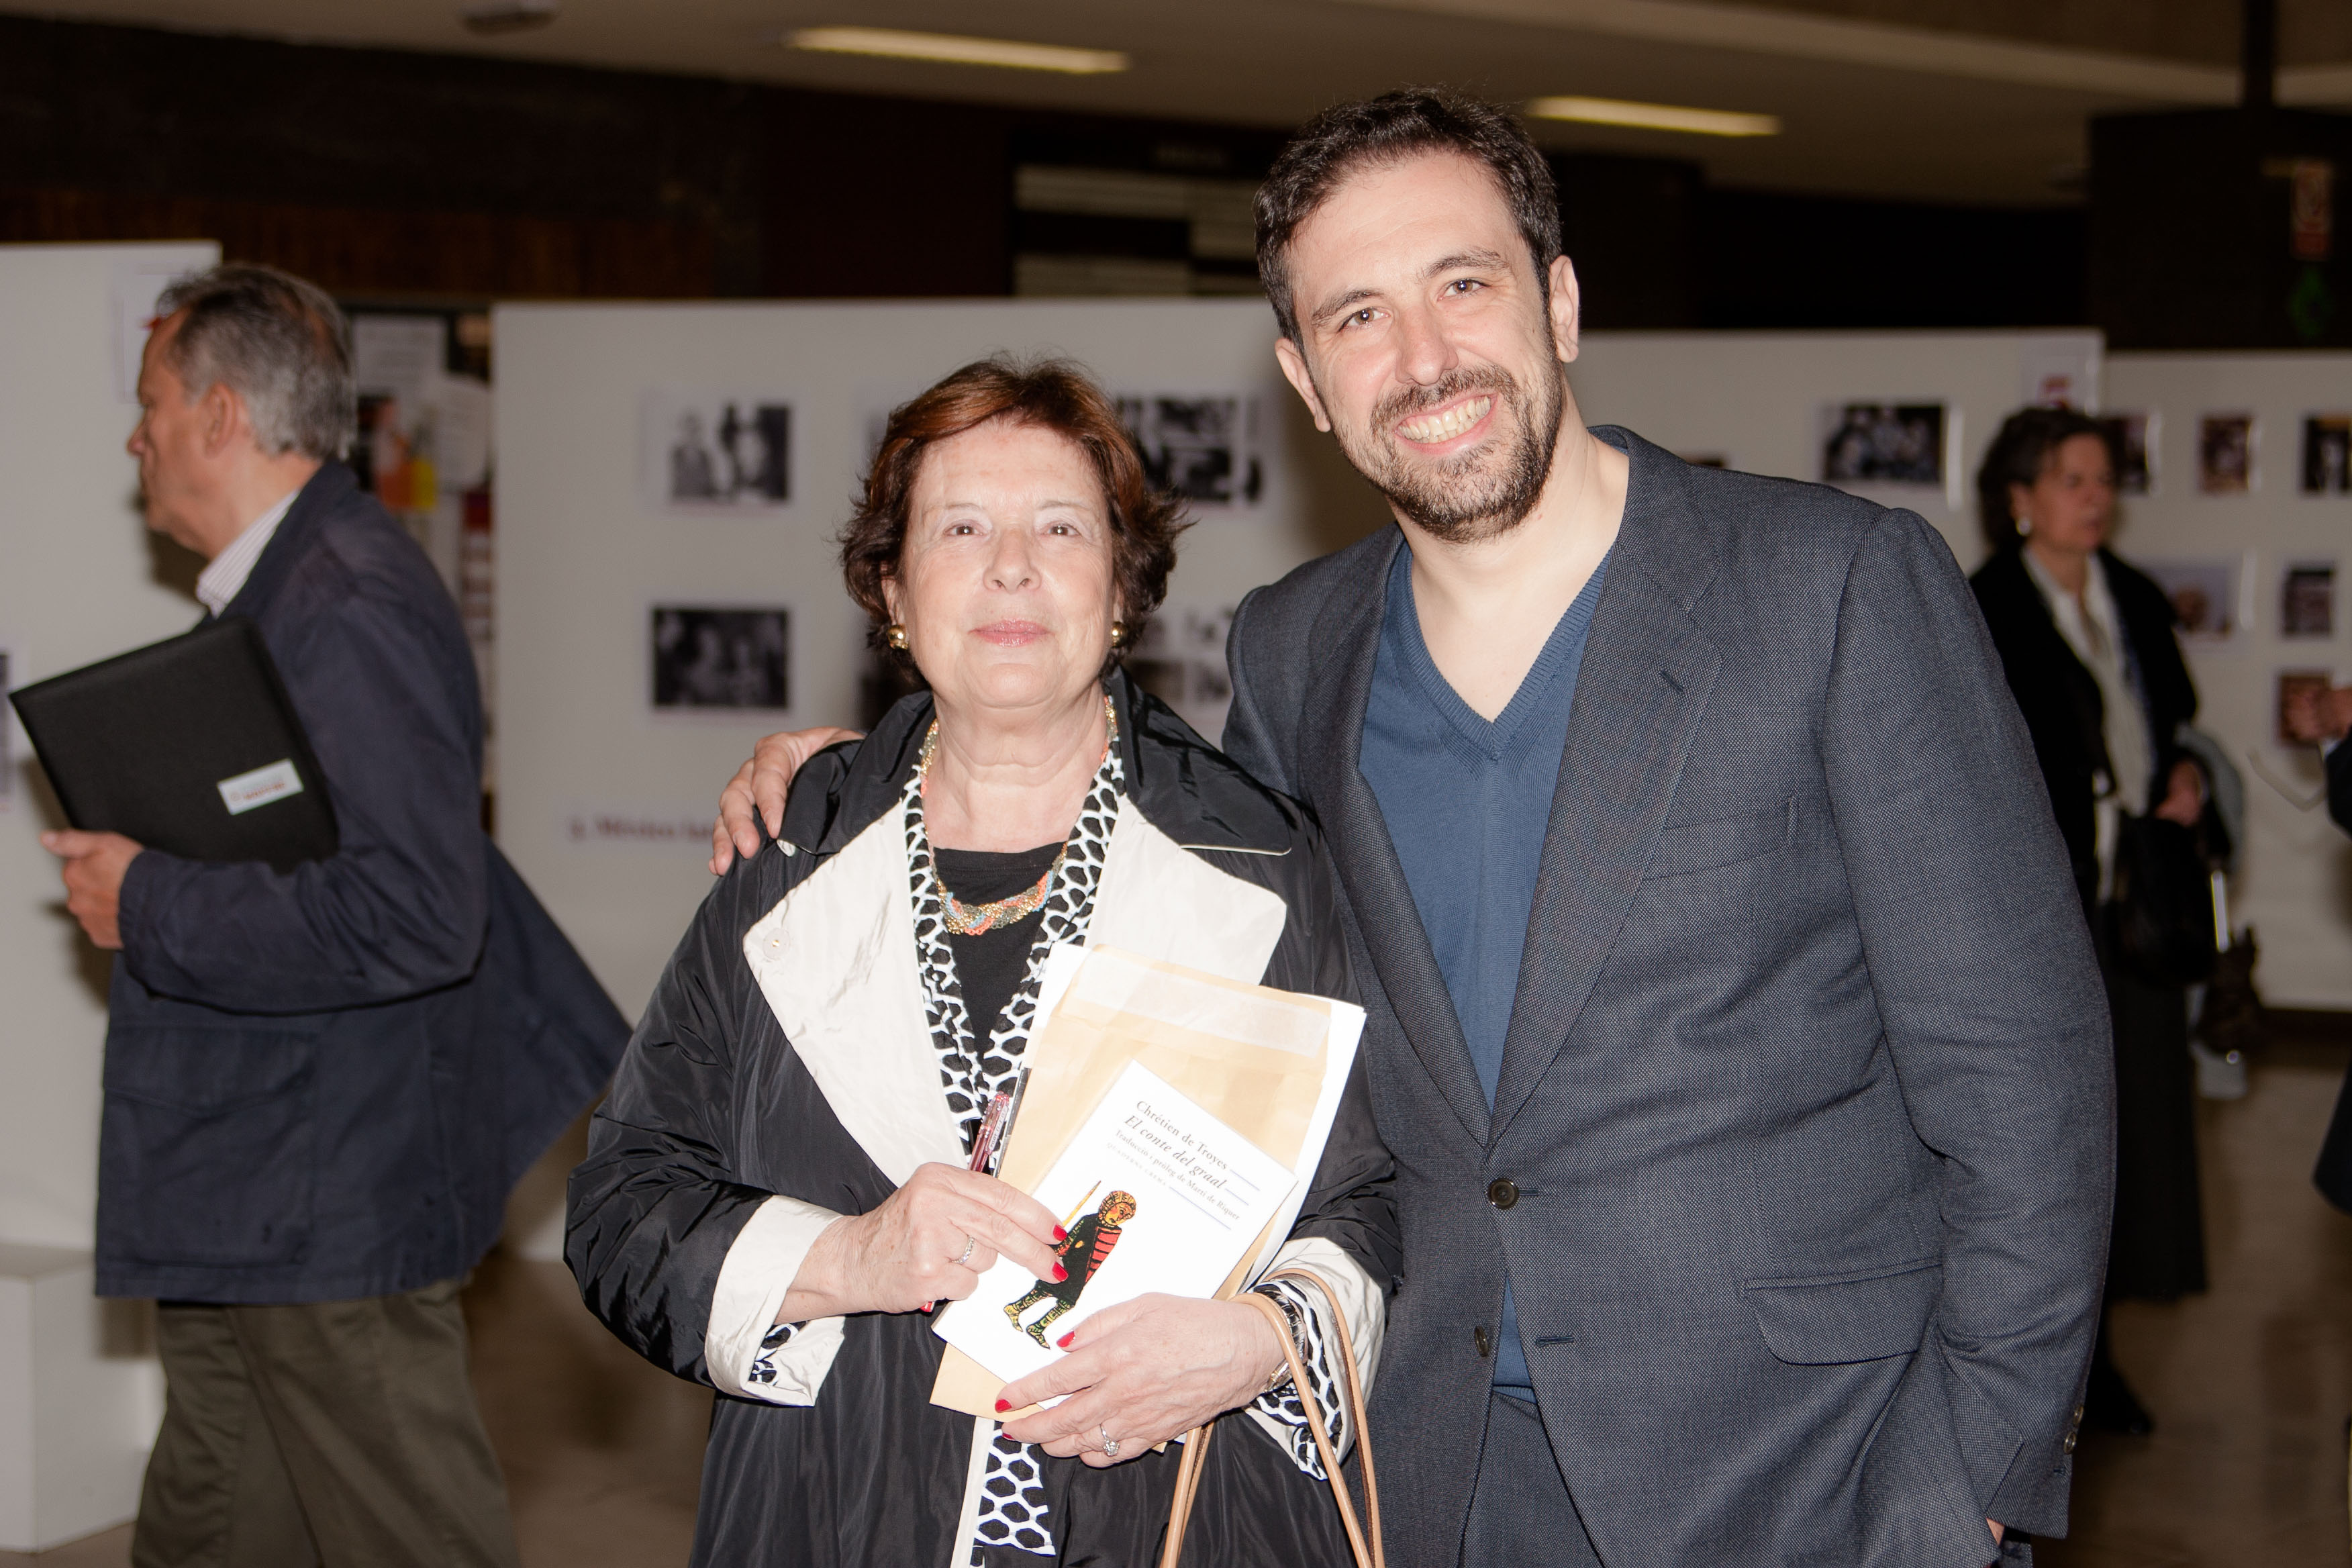 Homenaje Martin de Riquer-Foto Lazarina Kanorova5062.jpg